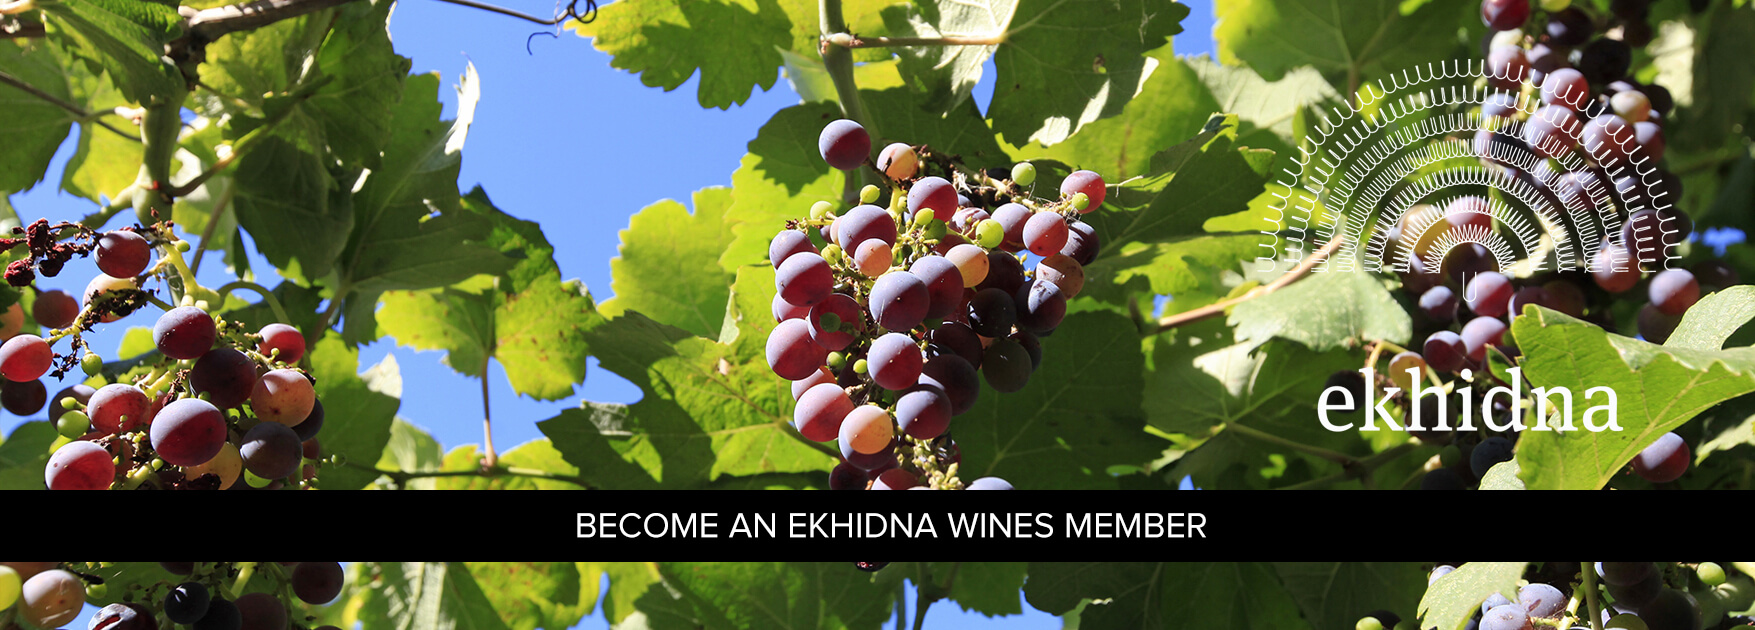 Ekhidna Wines Member